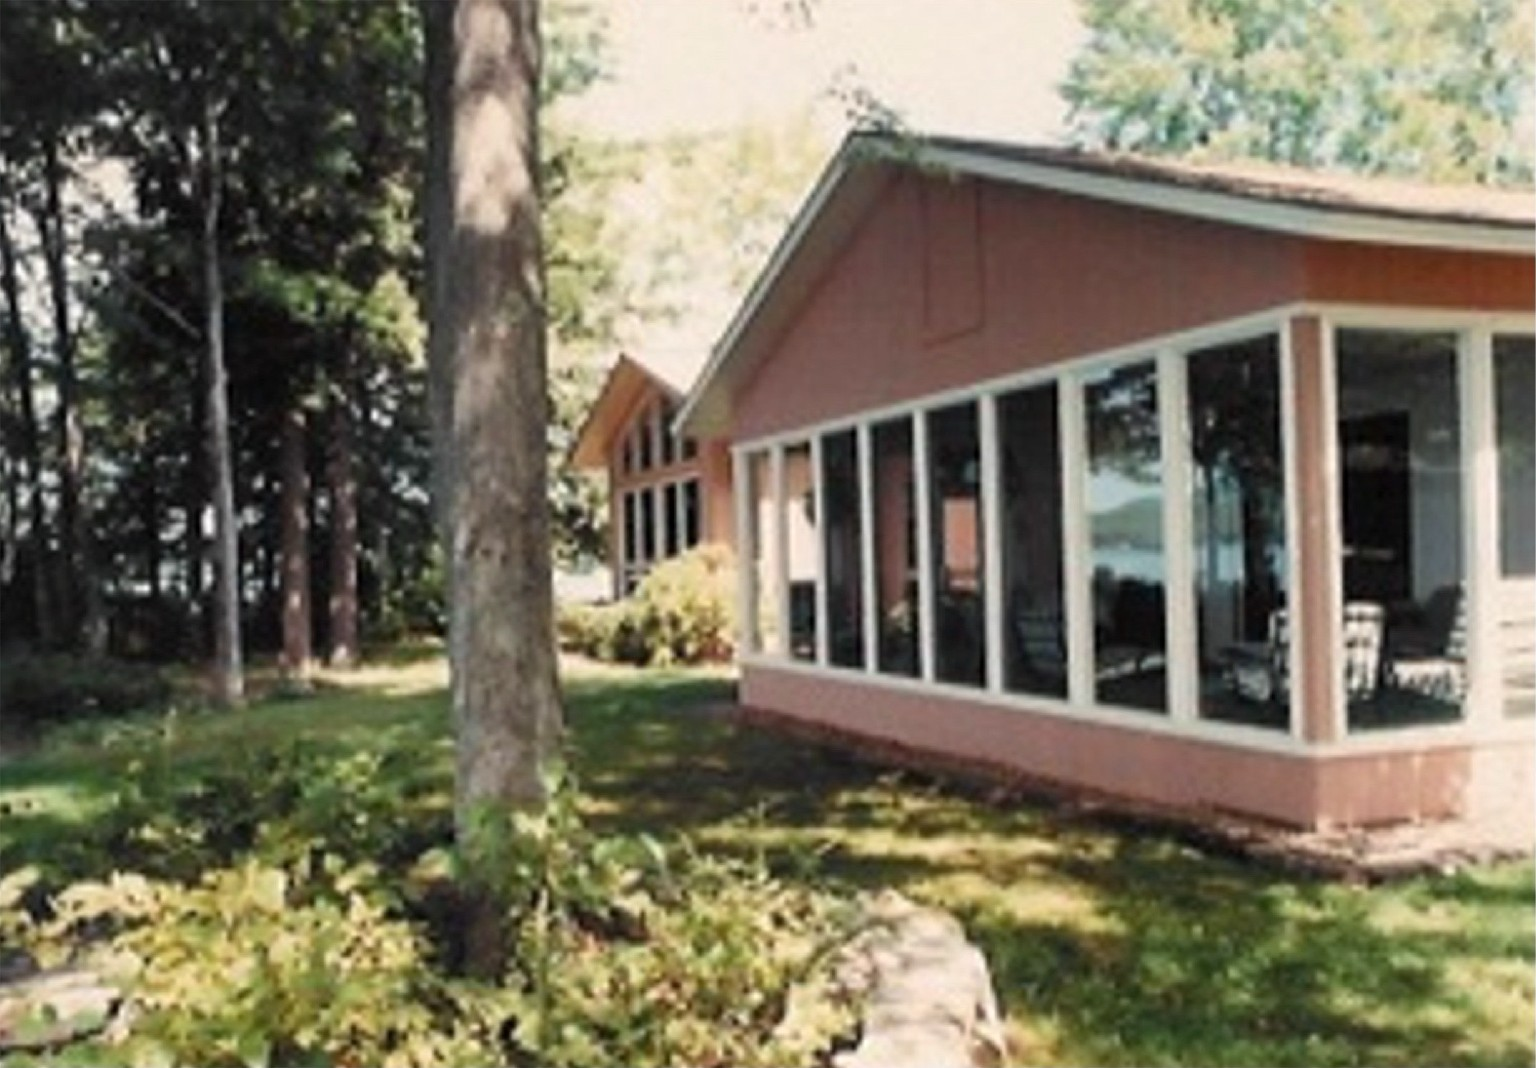 3 Season Porch Addition By Sunrooms Essex County Sunroom